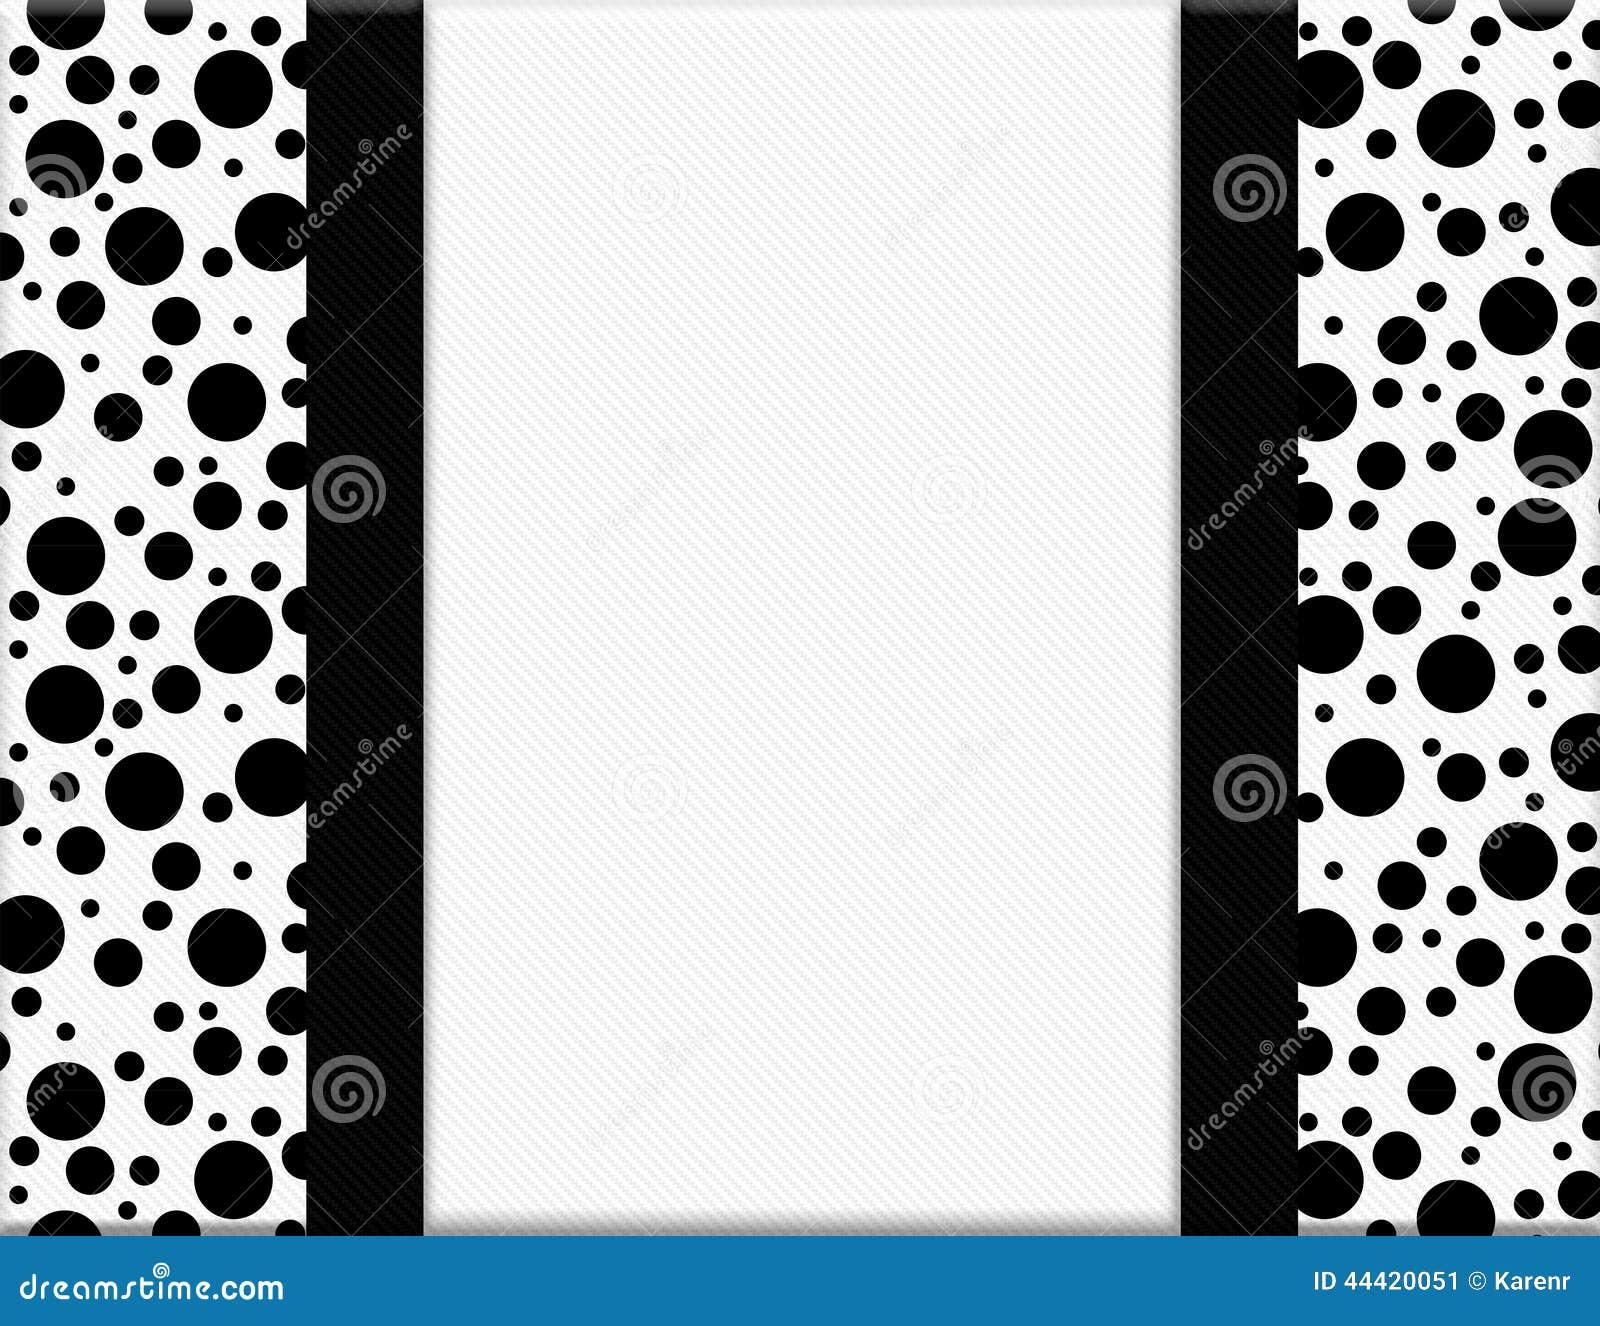 Black And White Polka Dot Frame With Ribbon Background Illustration ...